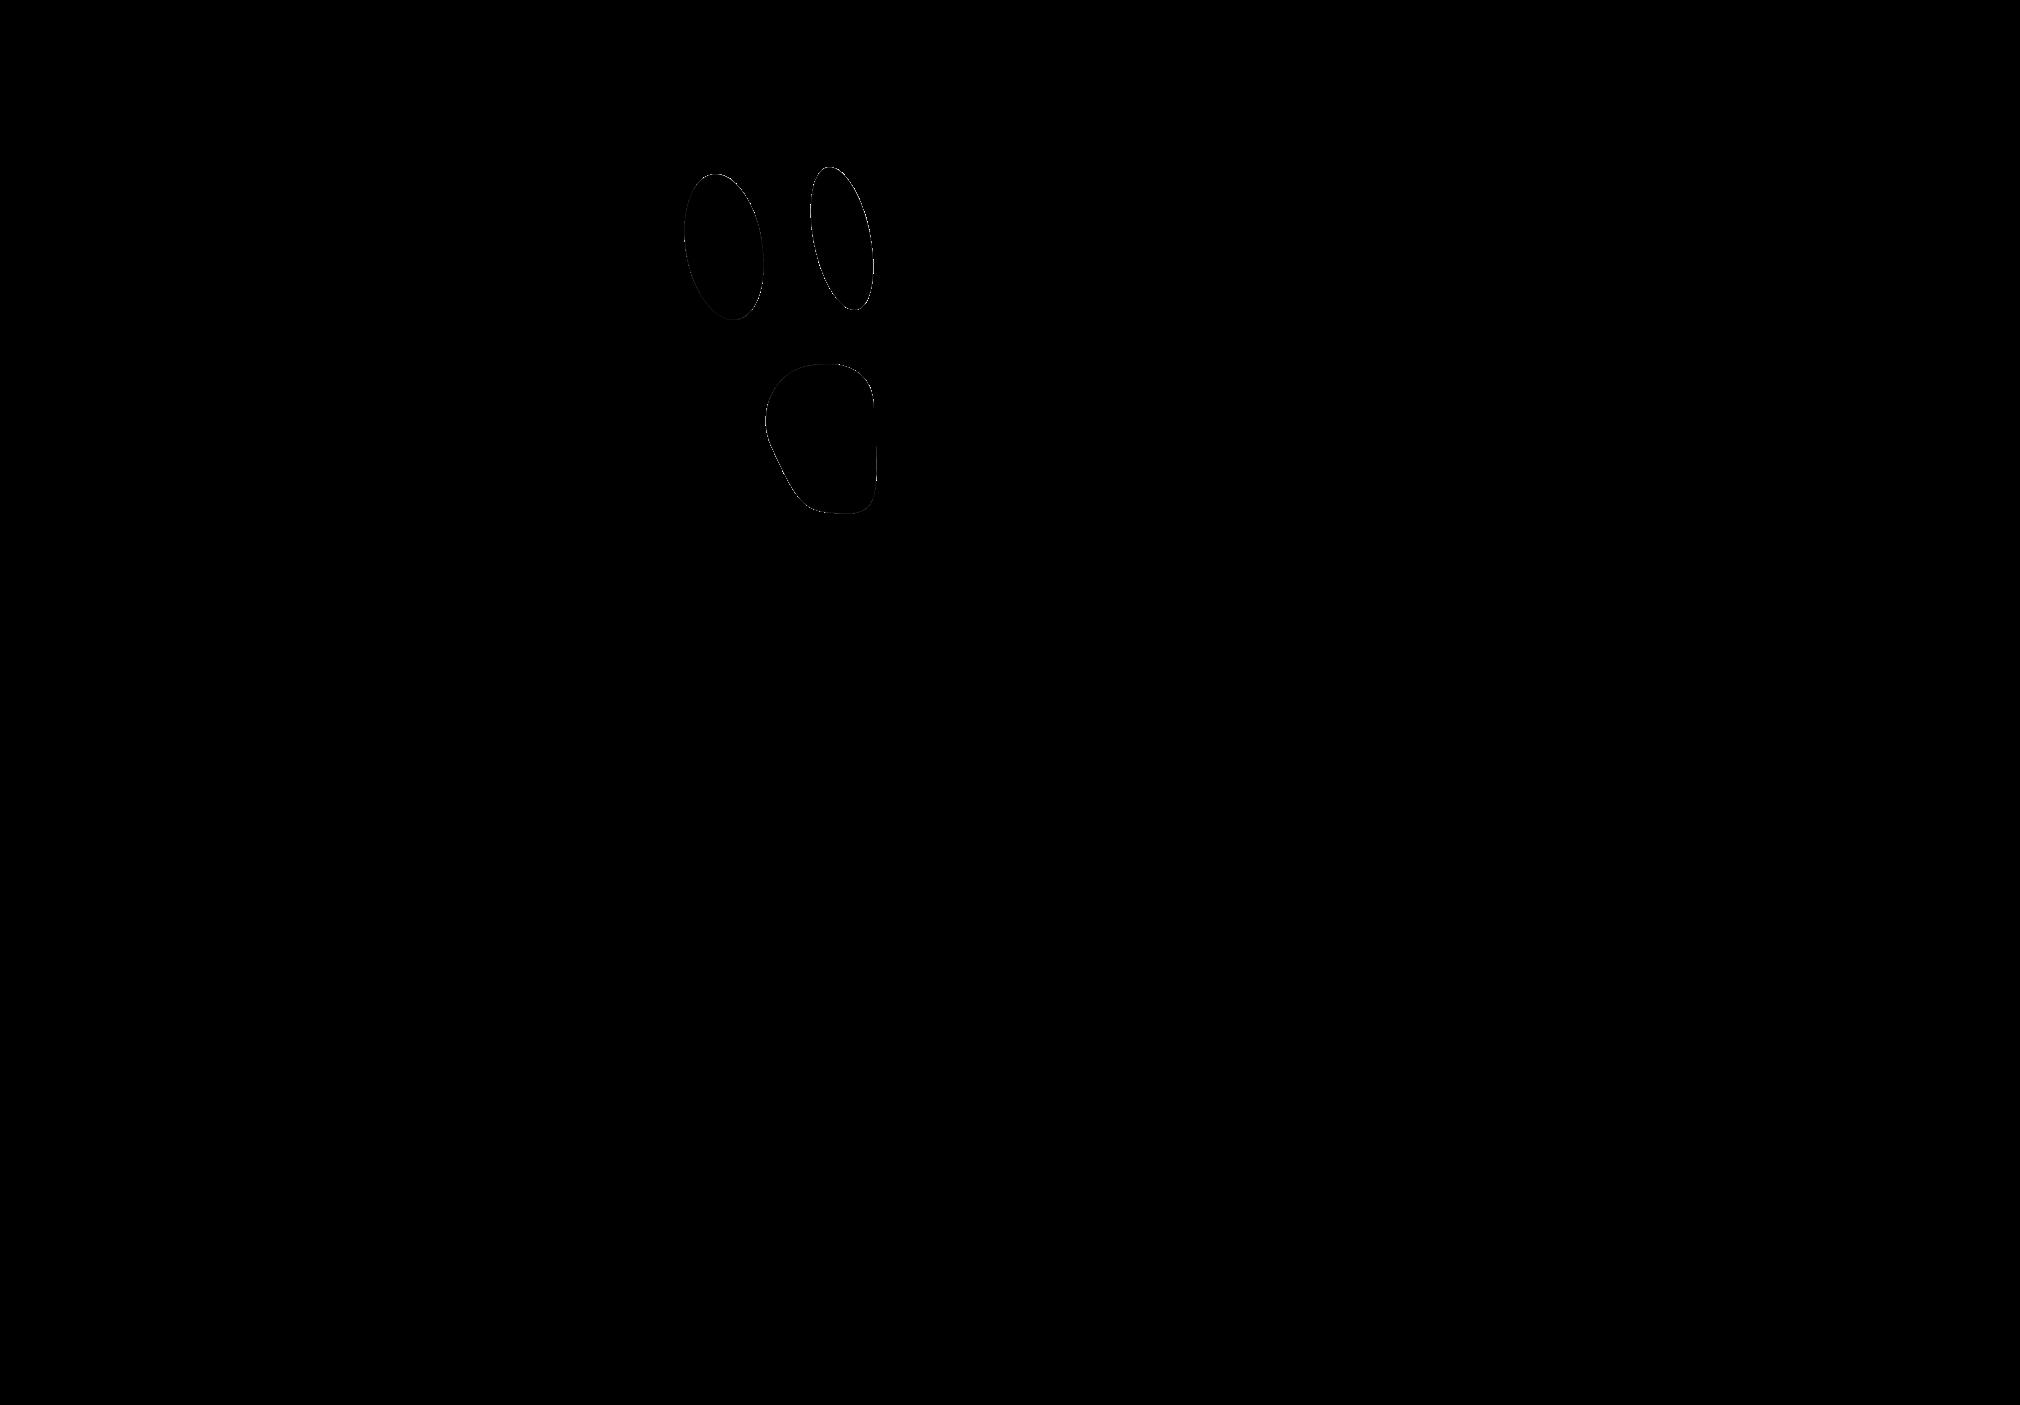 Ghost Clip Art-Ghost Clip Art-7